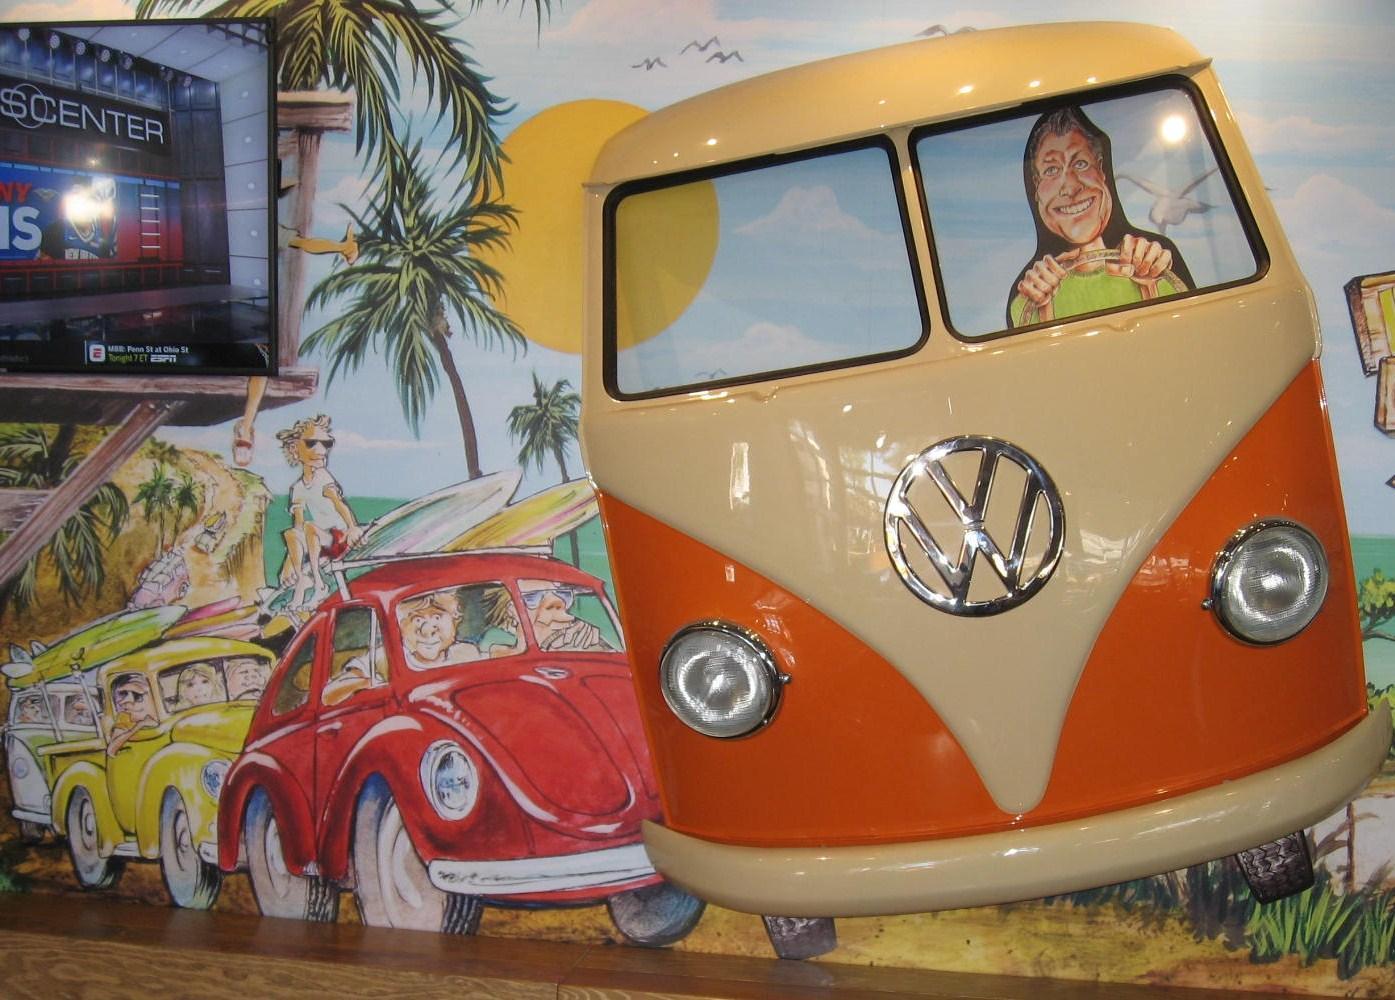 VW bus art